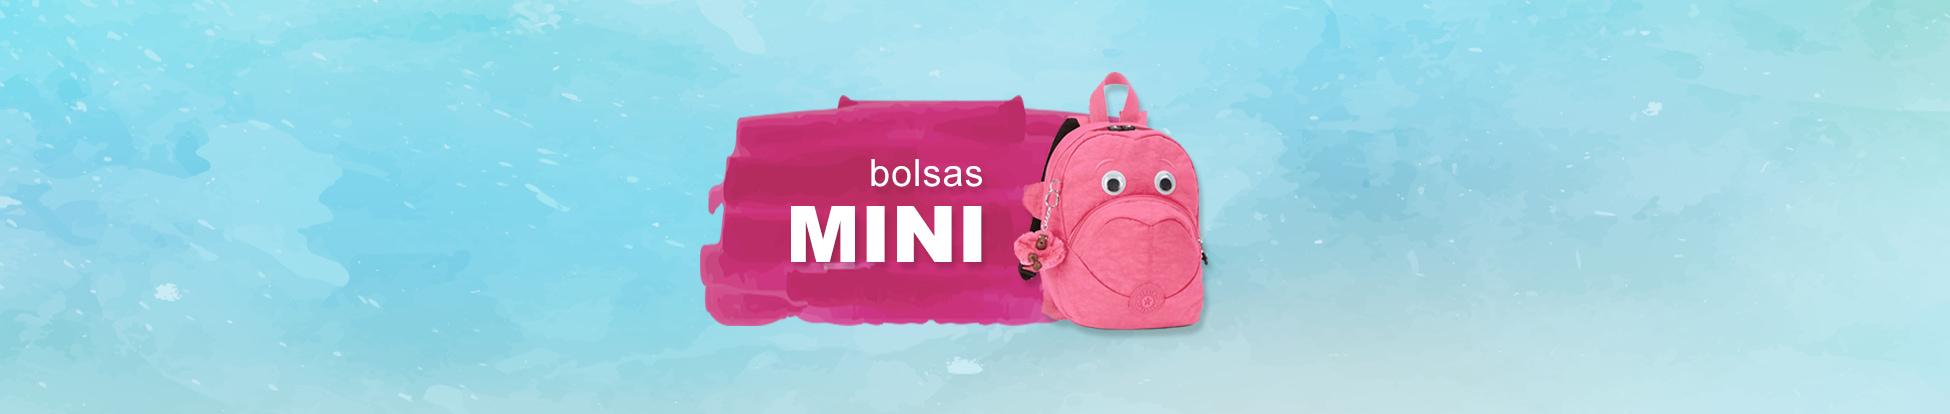 Bolsas - Mini